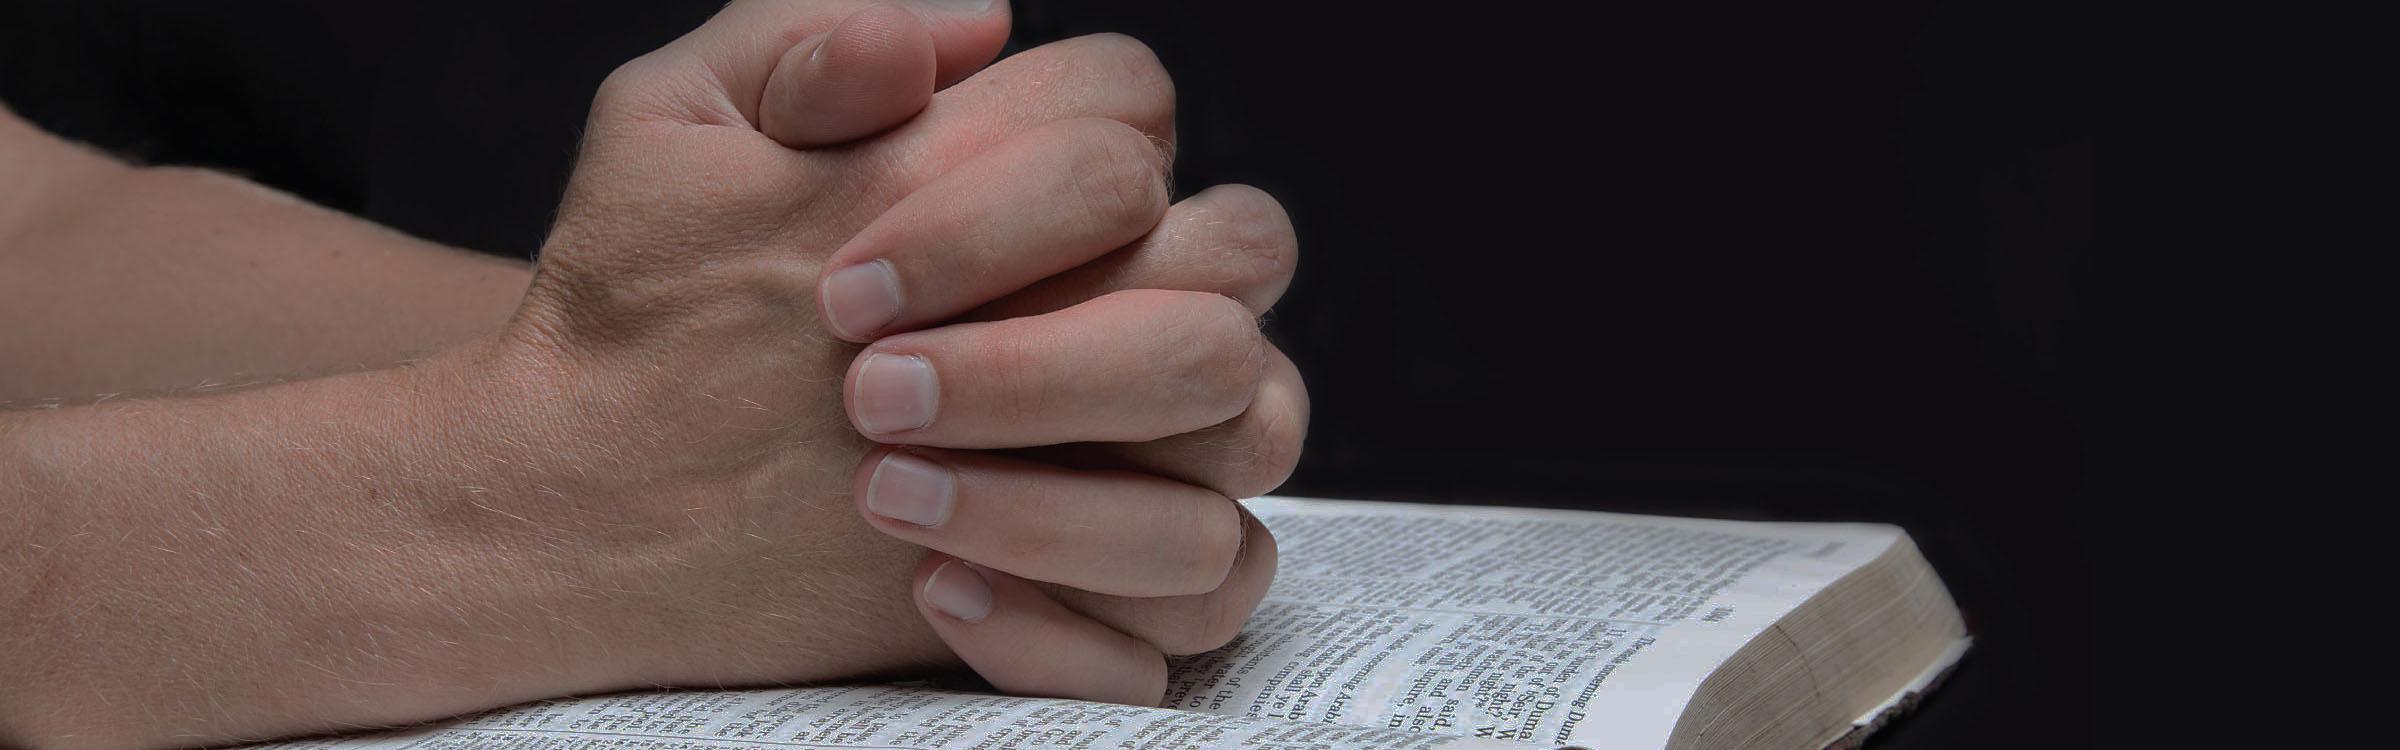 Faith formation at Central United Methodist Church